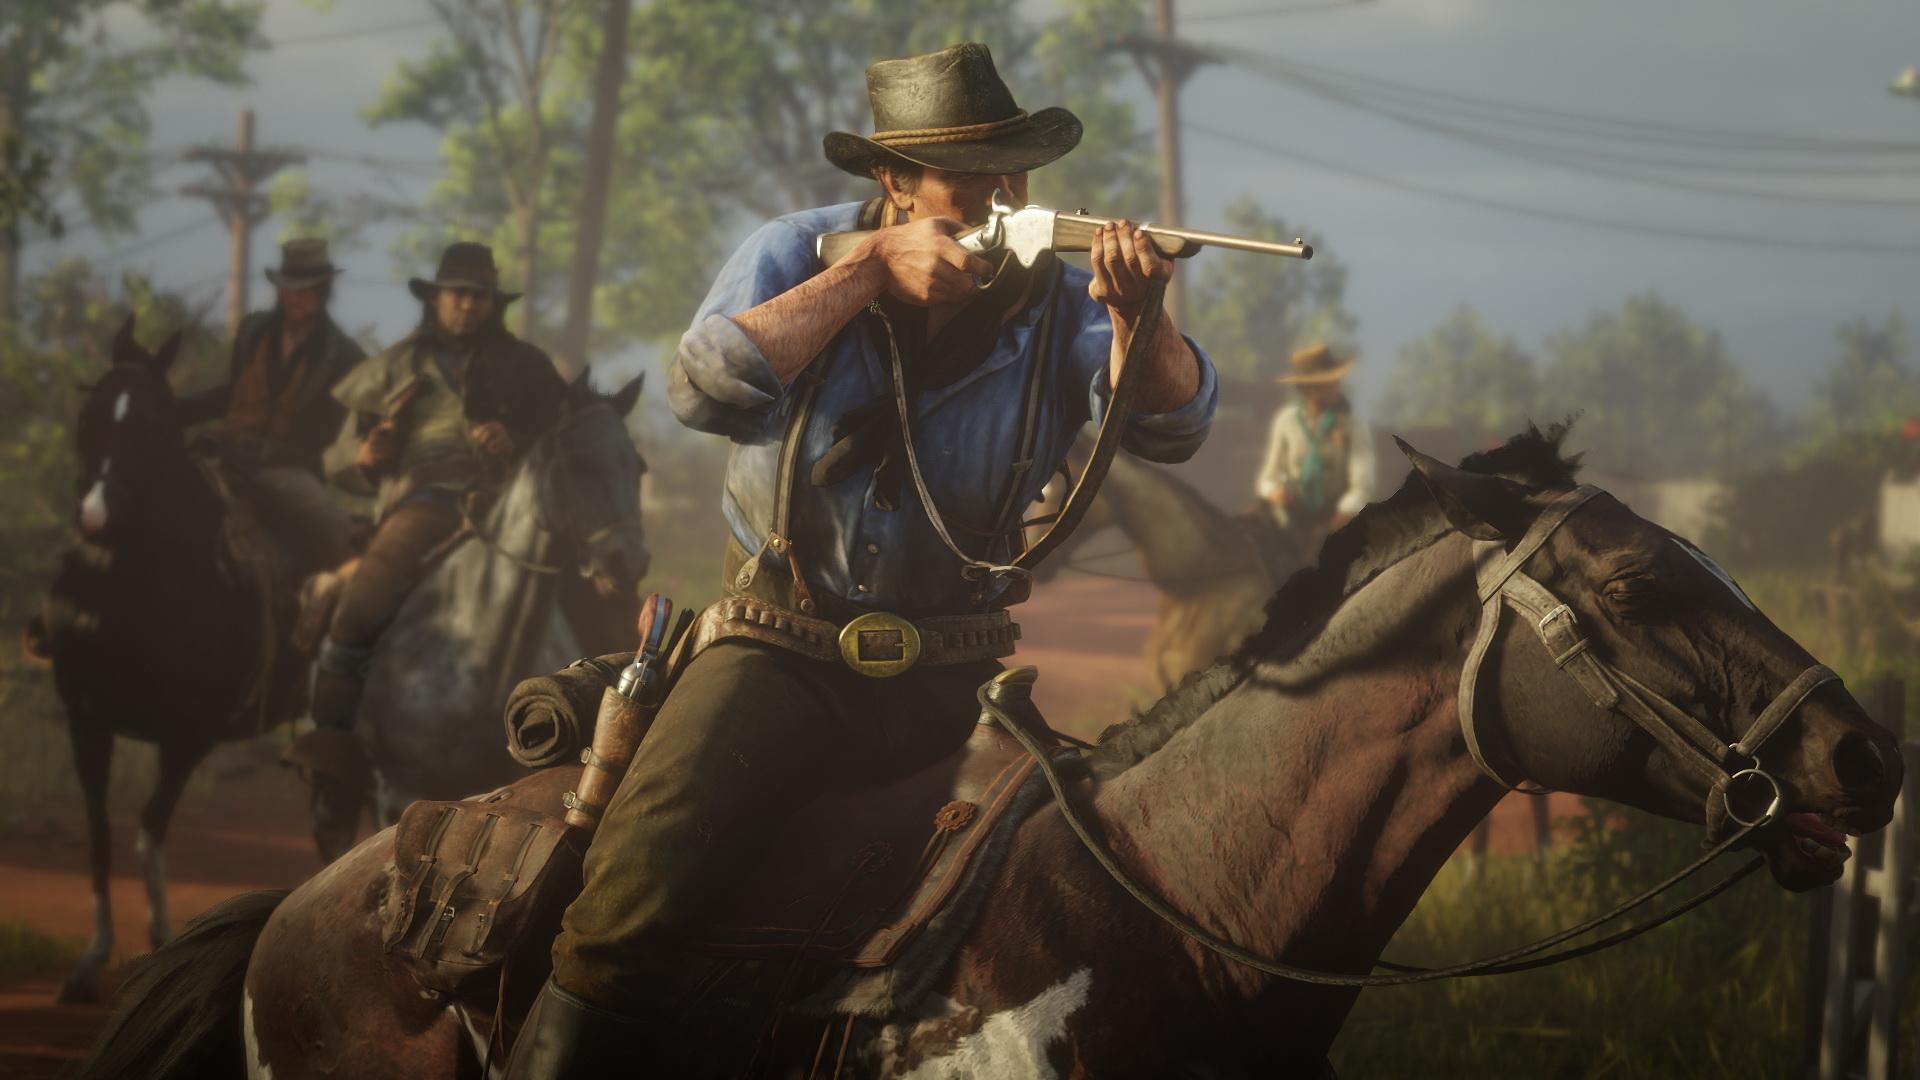 Вышел релизный трейлер Red Dead Redemption 2 наPC